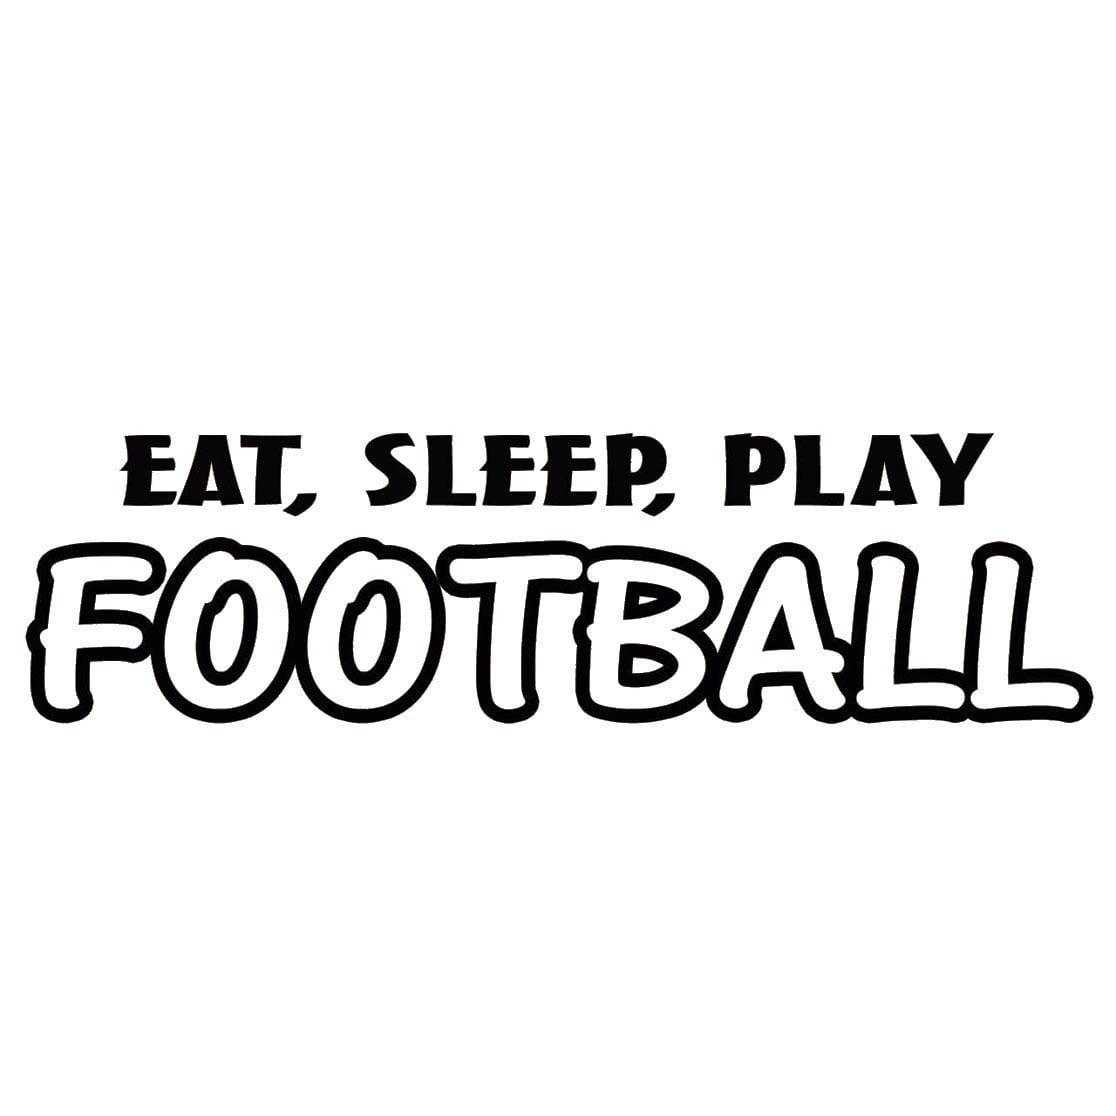 Vwaq Eat Sleep Play Football Wall Decal Sports Wall Quote